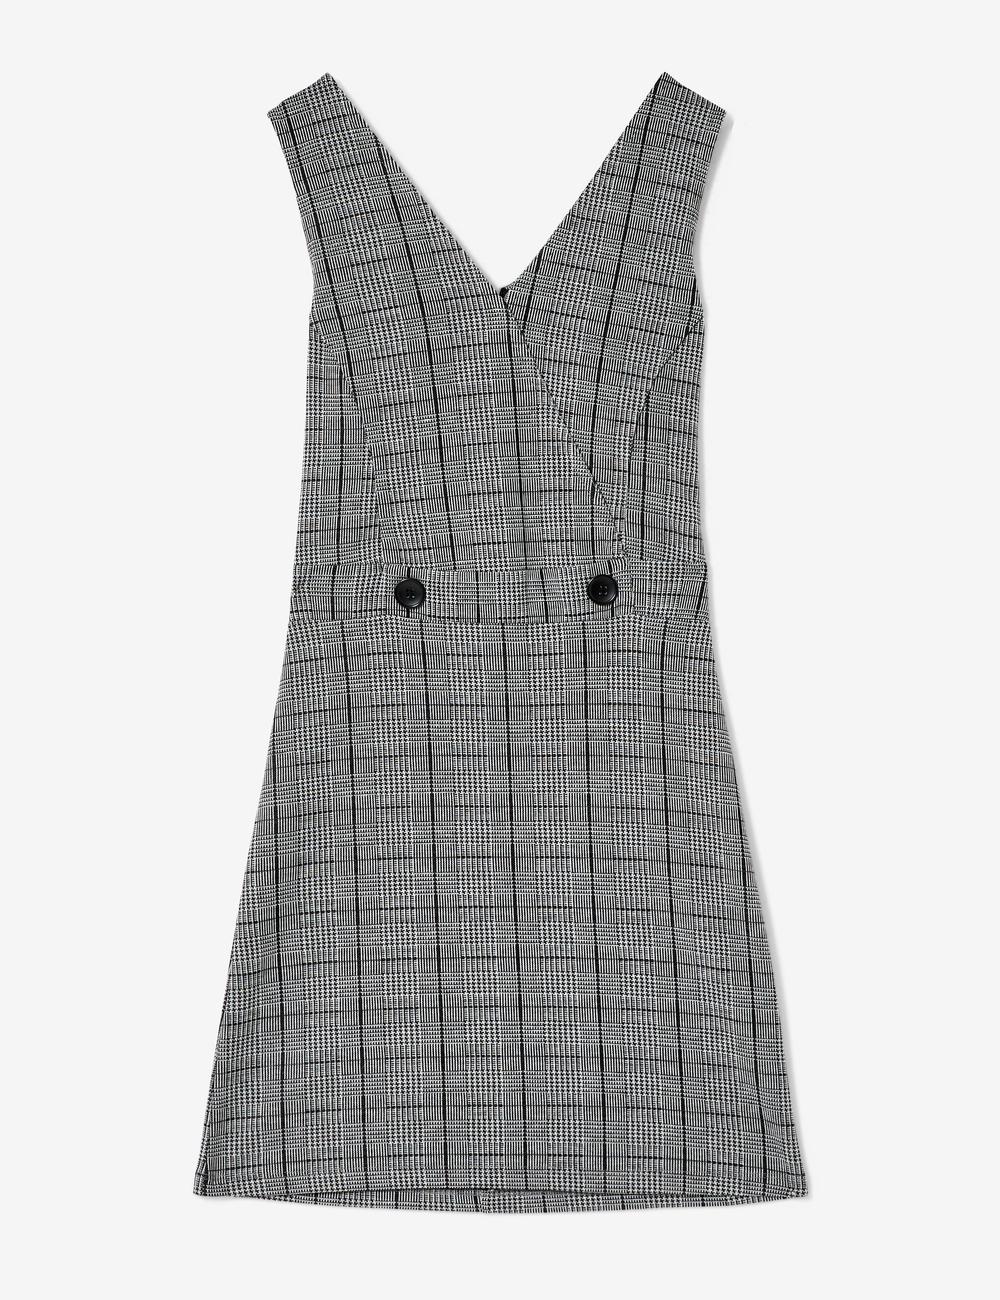 Robe Femme Pull Courte Patineuse Imprimée Jennyfer